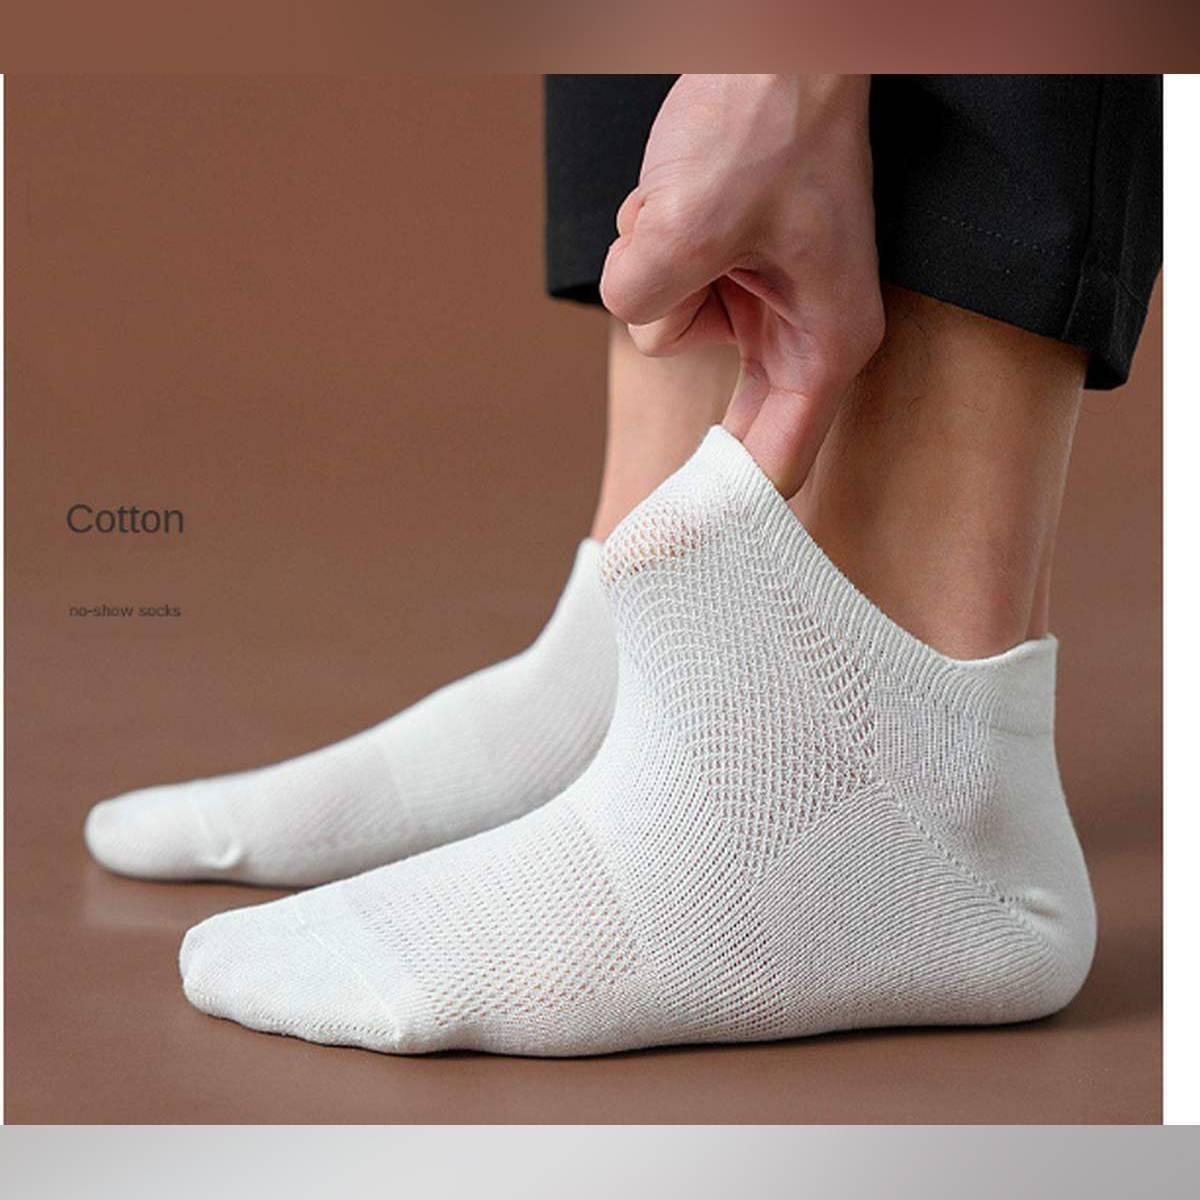 2 pair Hot Sale Solid Mesh Men's Socks Invisible Ankle Socks Men Summer Breathable Thin Boat Socks cheap price Men Boat Socks